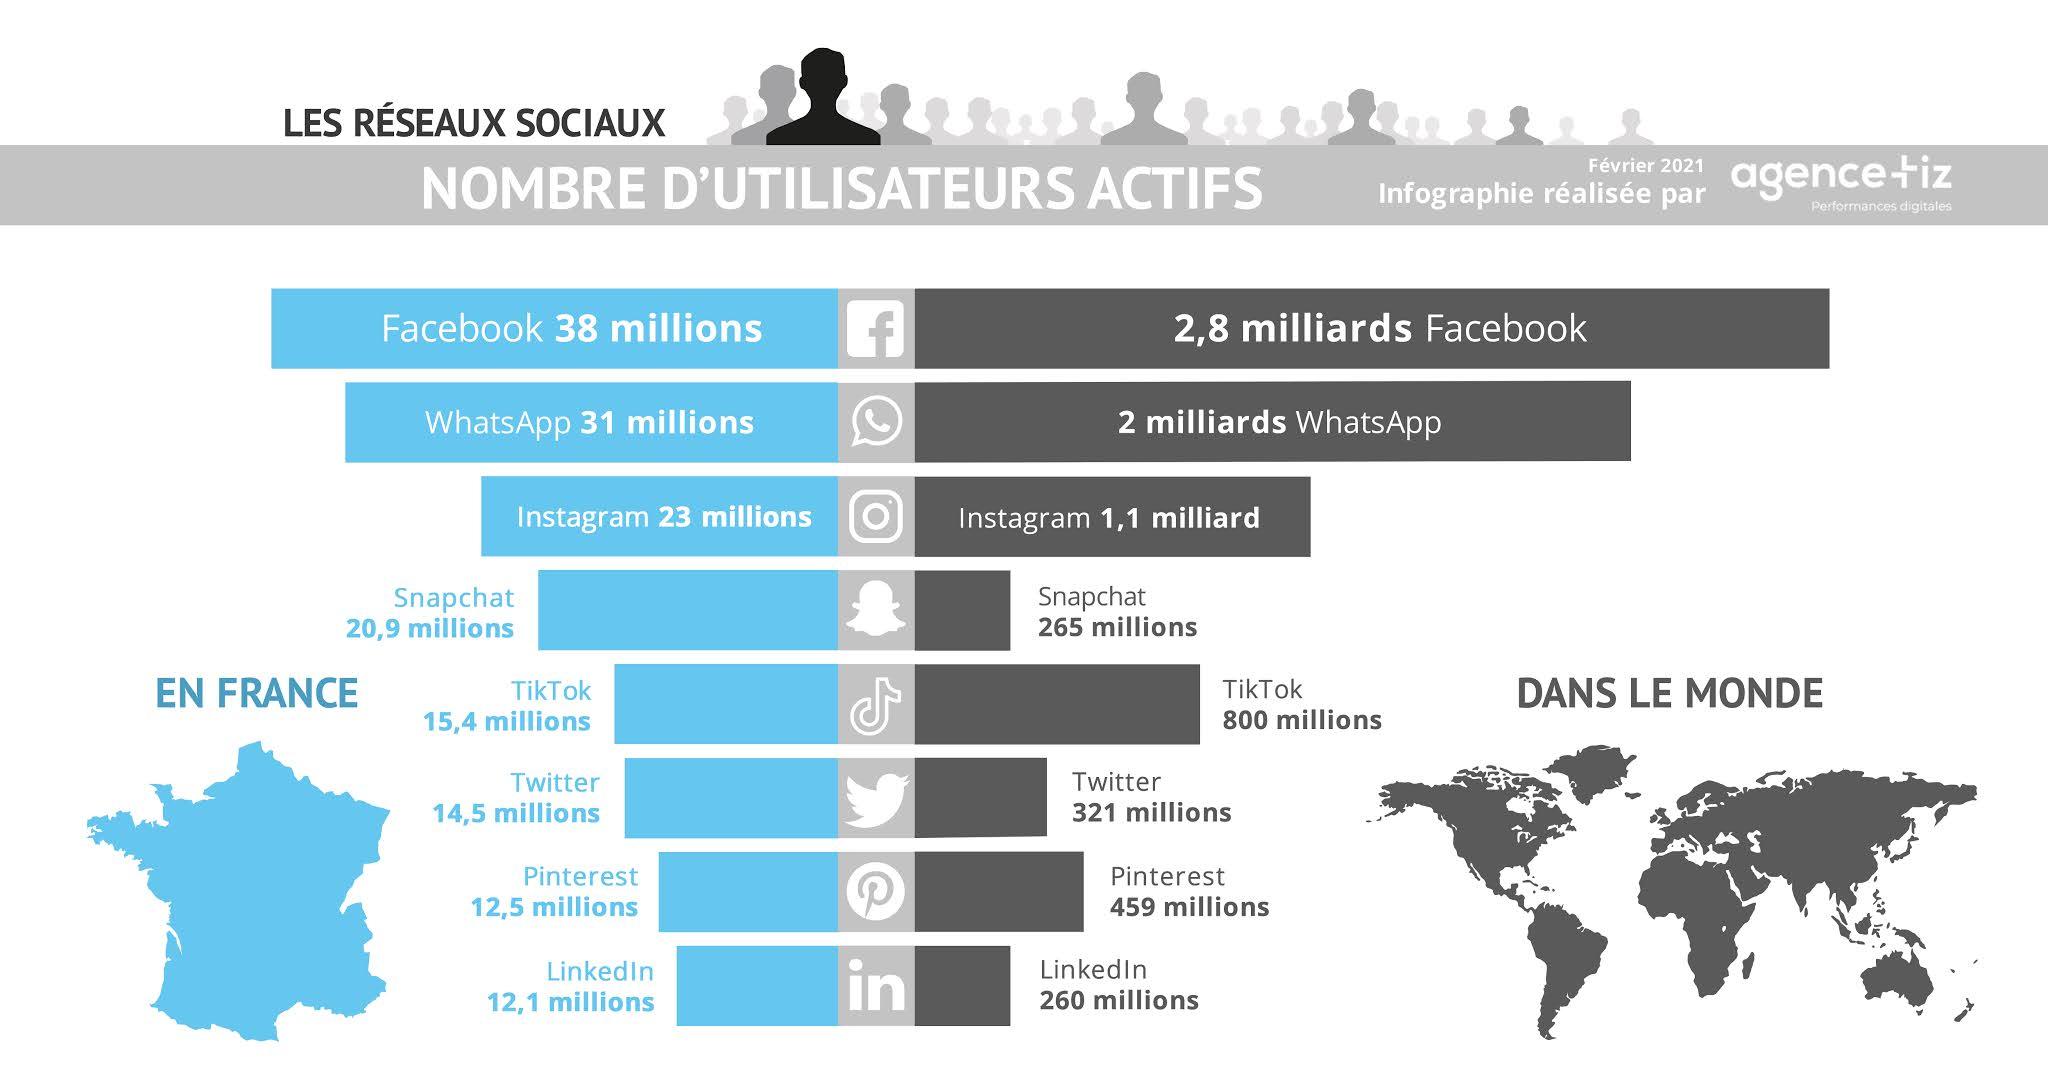 Nombre d'utilisateurs Facebook, Instagram, TikTok, Twitter, Snapchat, WhatsApp, LinkedIn, Pinterest - France et Monde